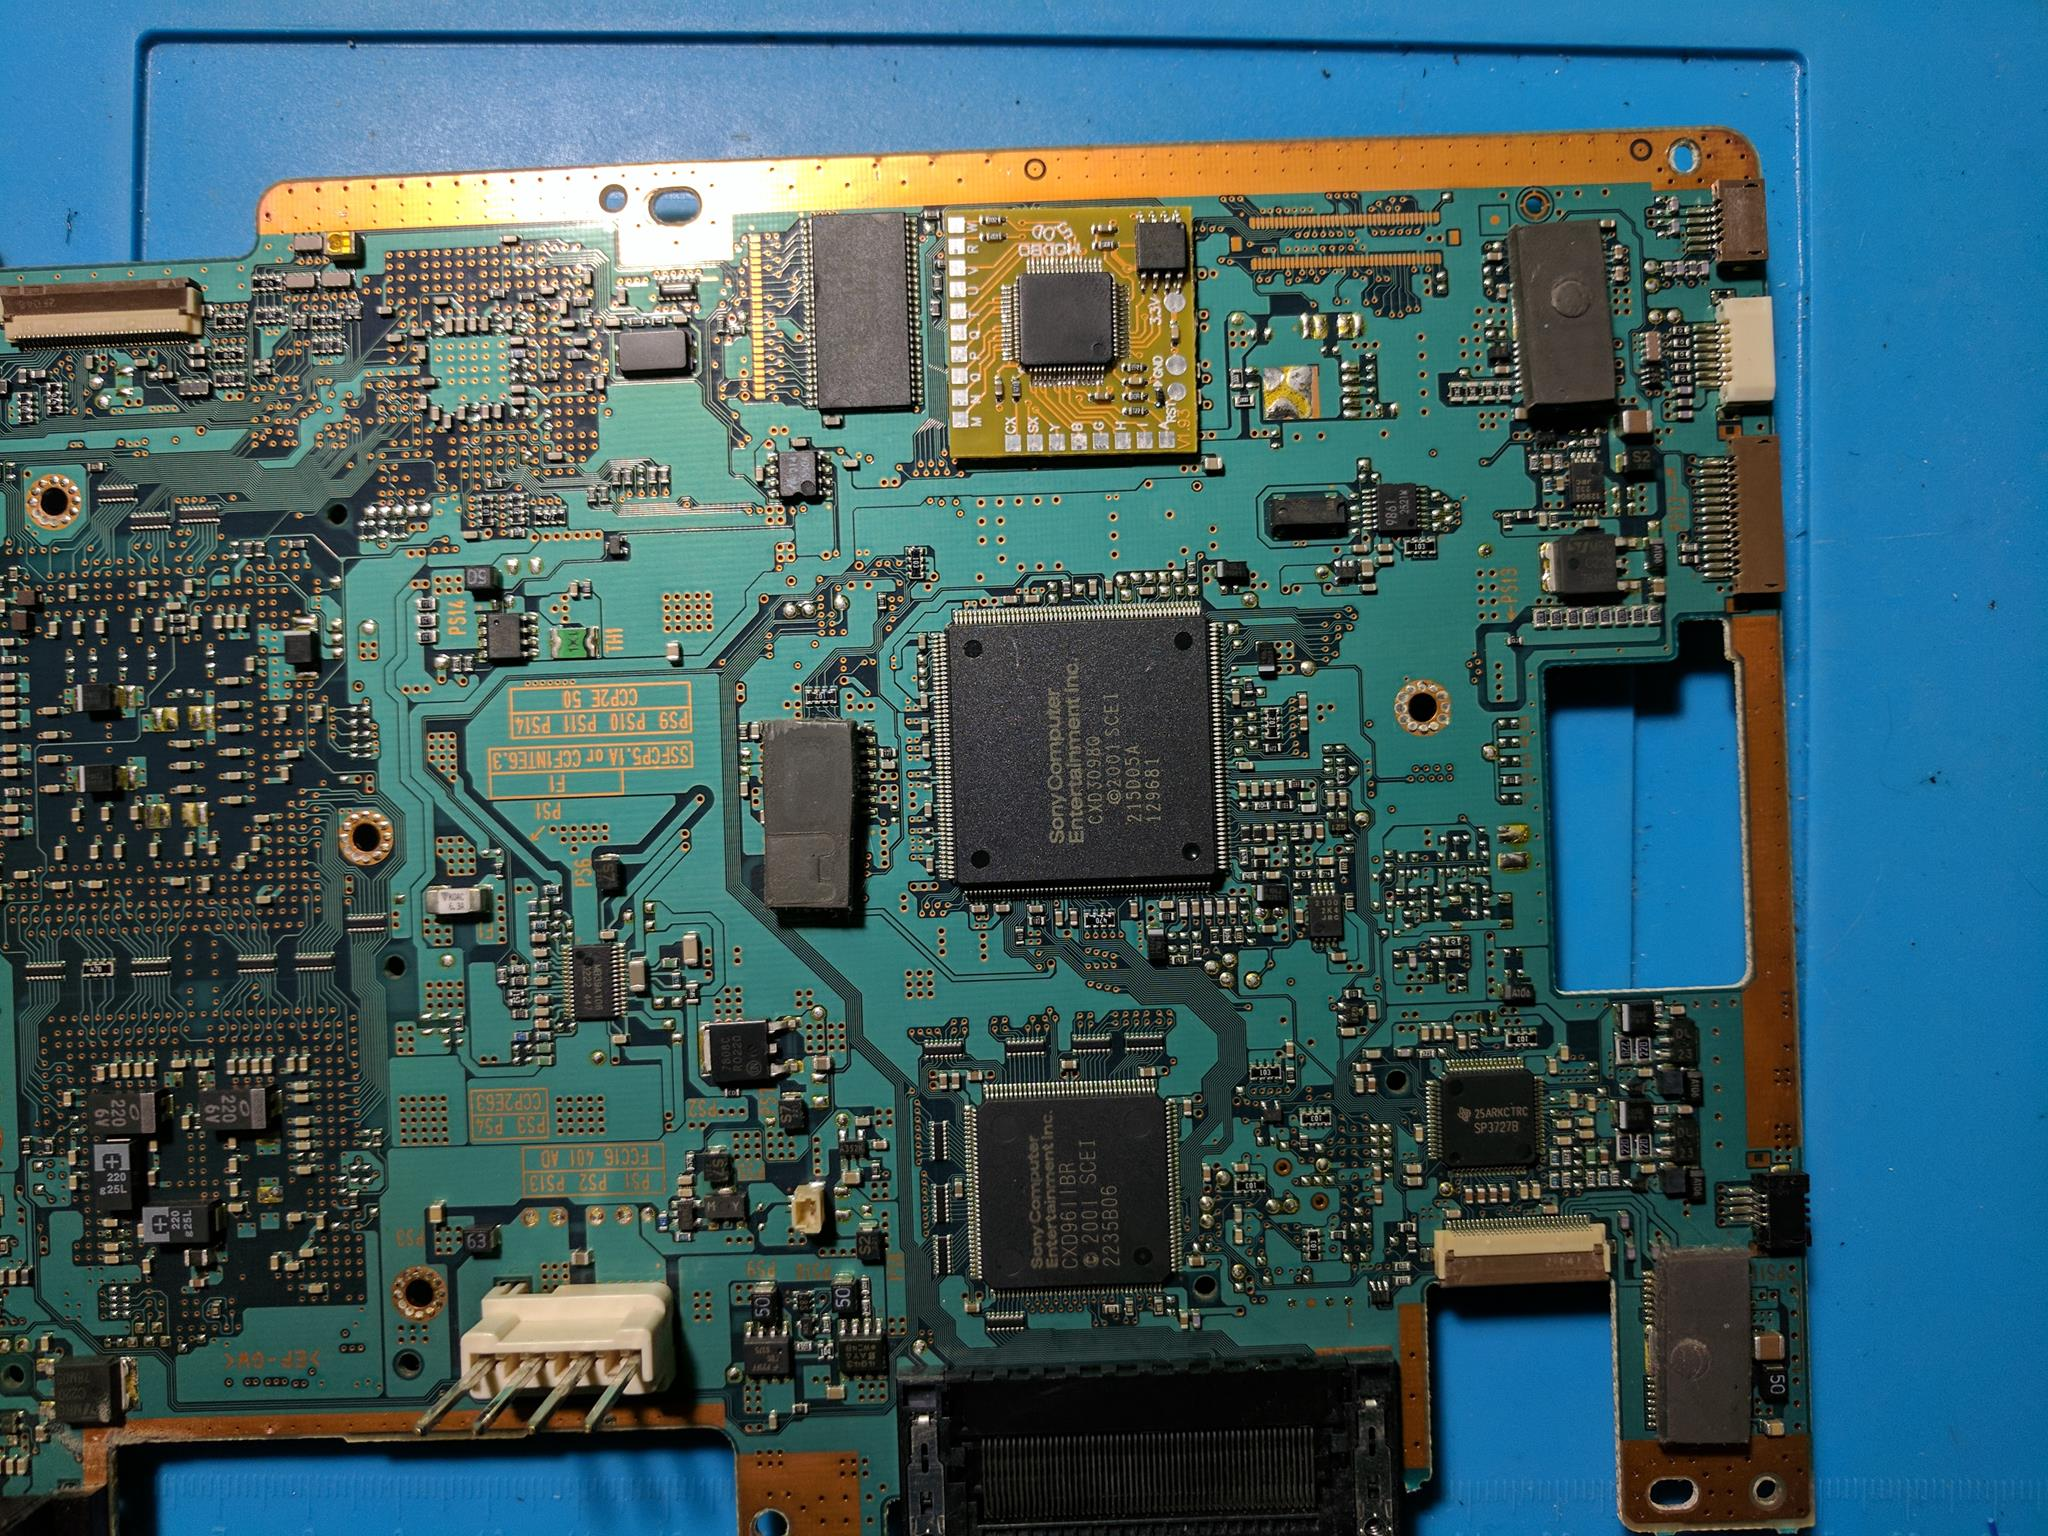 Scph 39001 Ps2 Modbo 50 Modchip Installation V7 Ntsc Board Playstation 2 Wiring Diagram Position